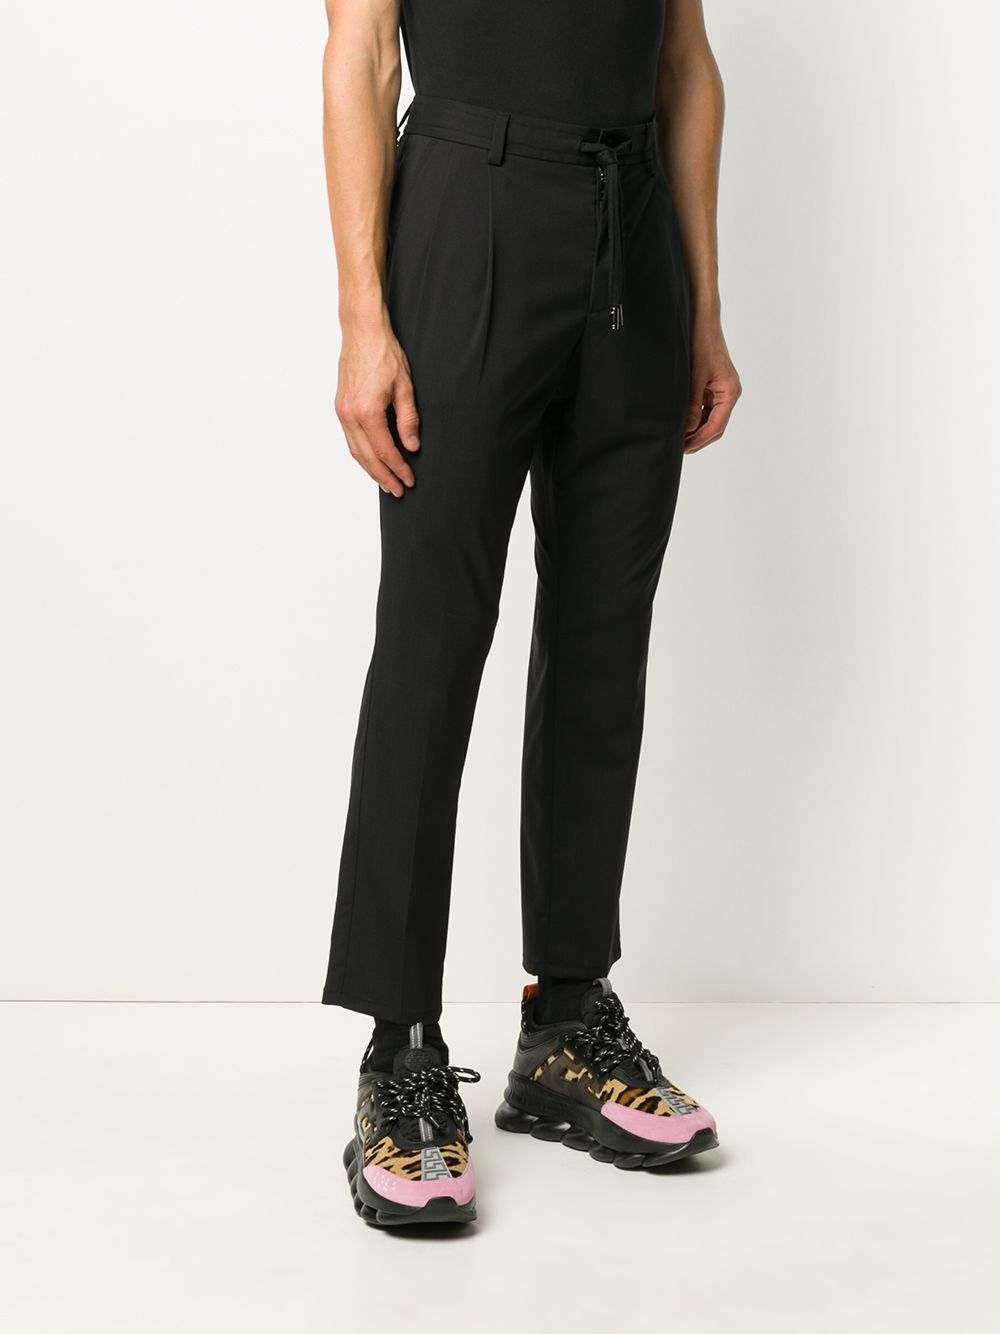 black virgin wool cropped tailored trousers DOLCE & GABBANA |  | GW08AT-FUBECN0000